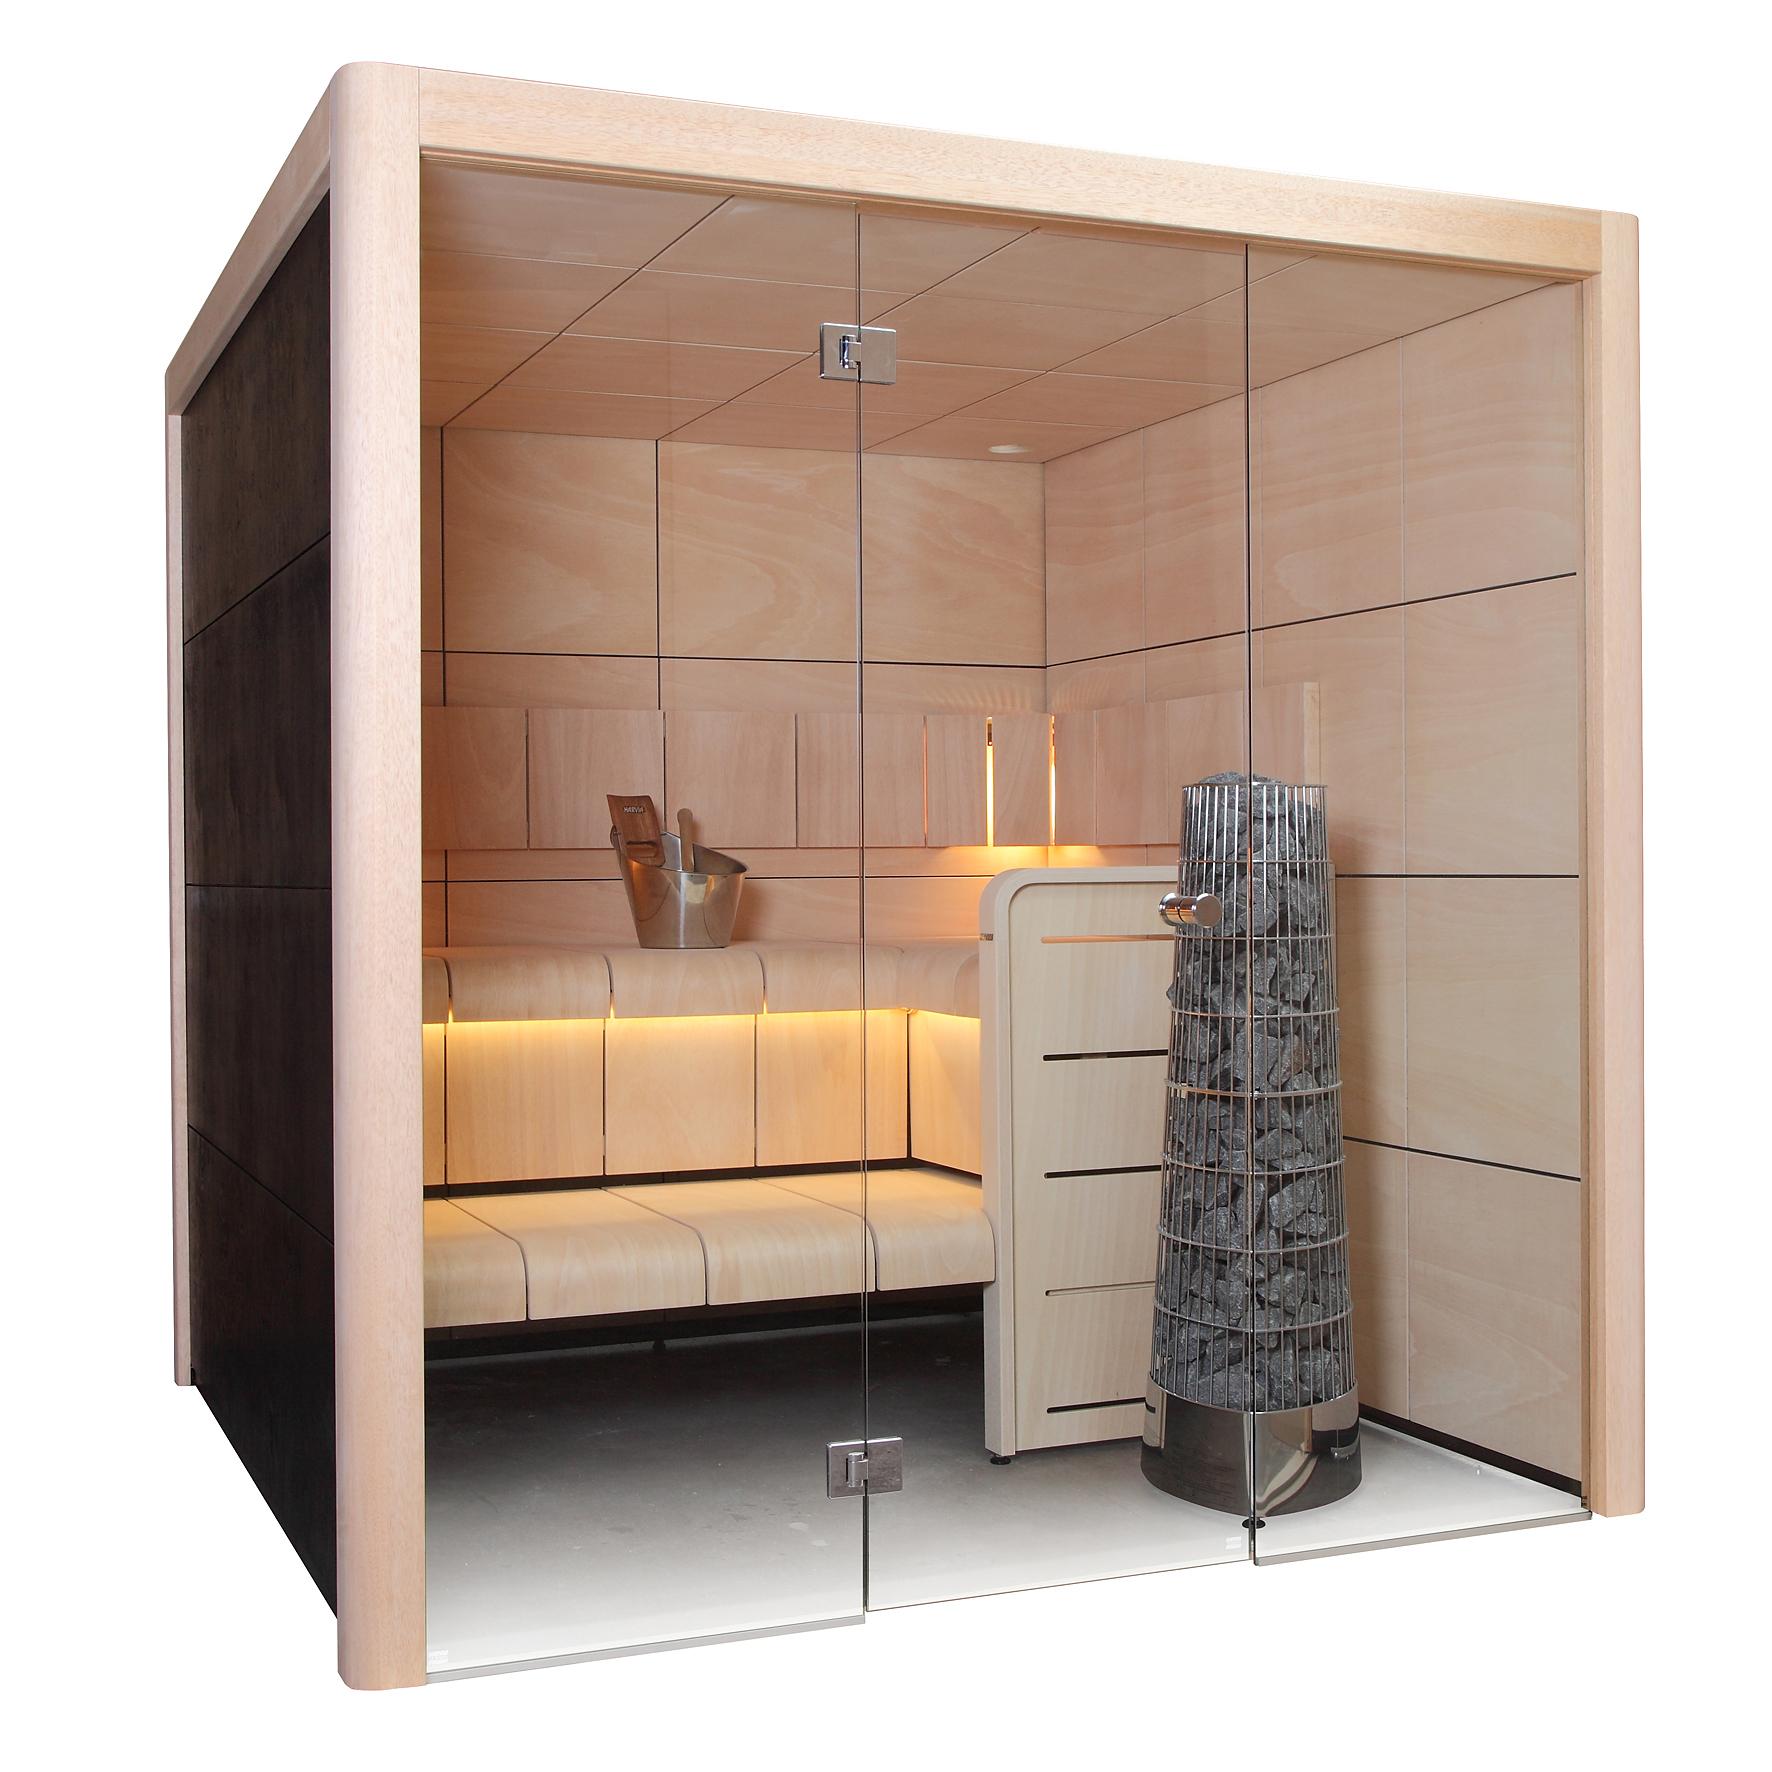 Cabine De Sauna Prix sauna – harvia sauna algérie